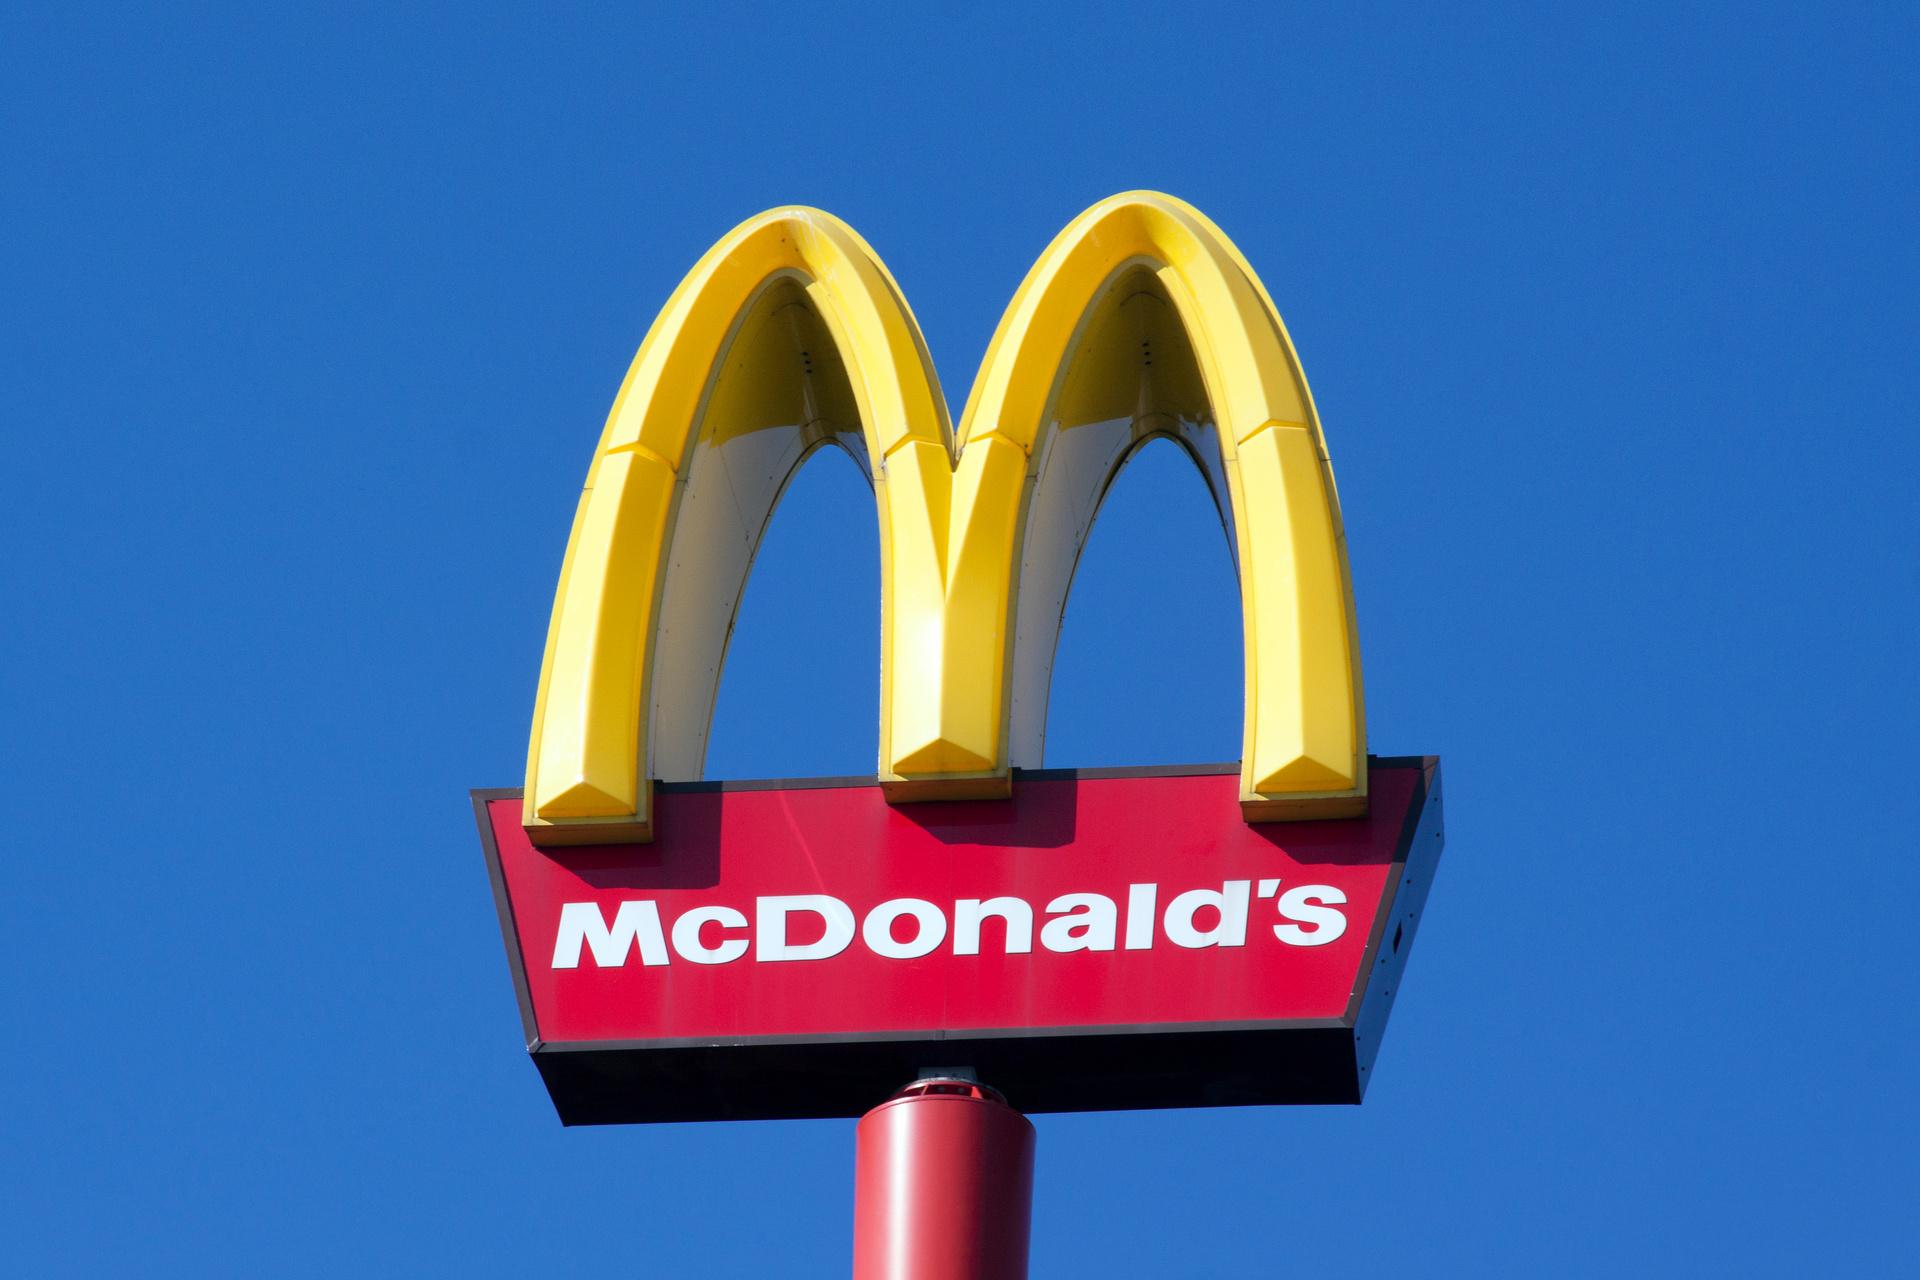 Irish burger chain Supermac's relishes trademark win over McDonald's Big Mac